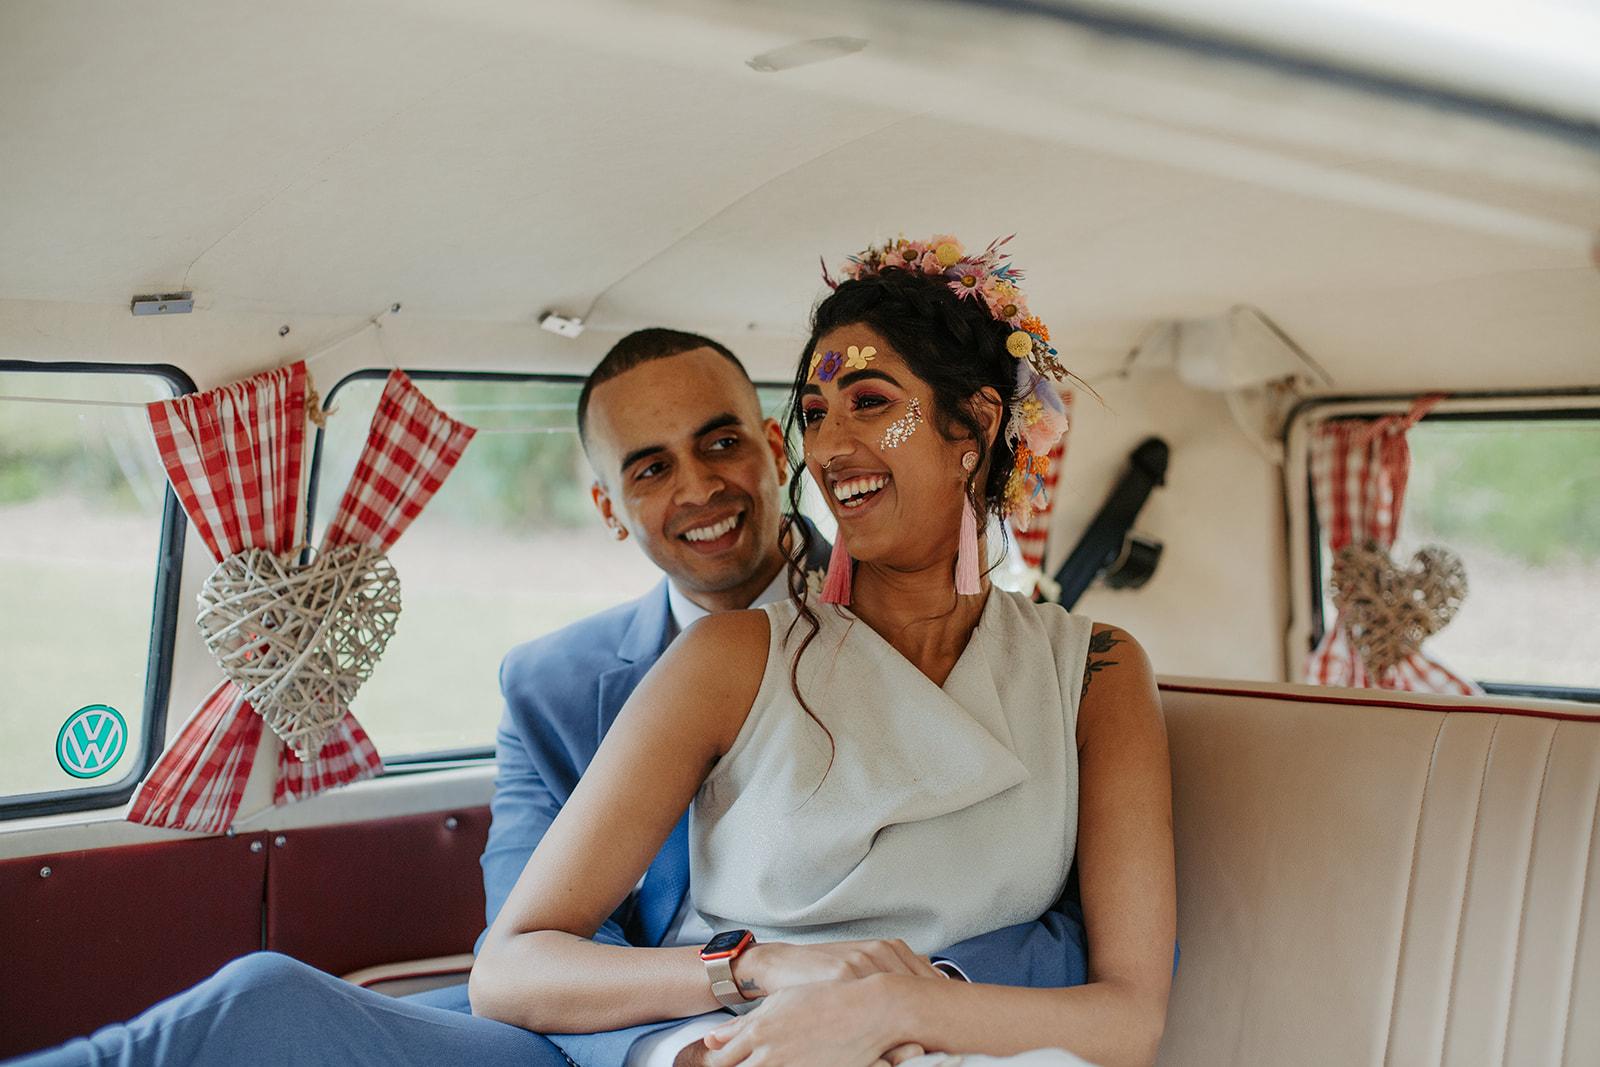 drive in wedding - camper van wedding - bride with festival makeup - festival bride - festival wedding ideas - bride and groom in camper van